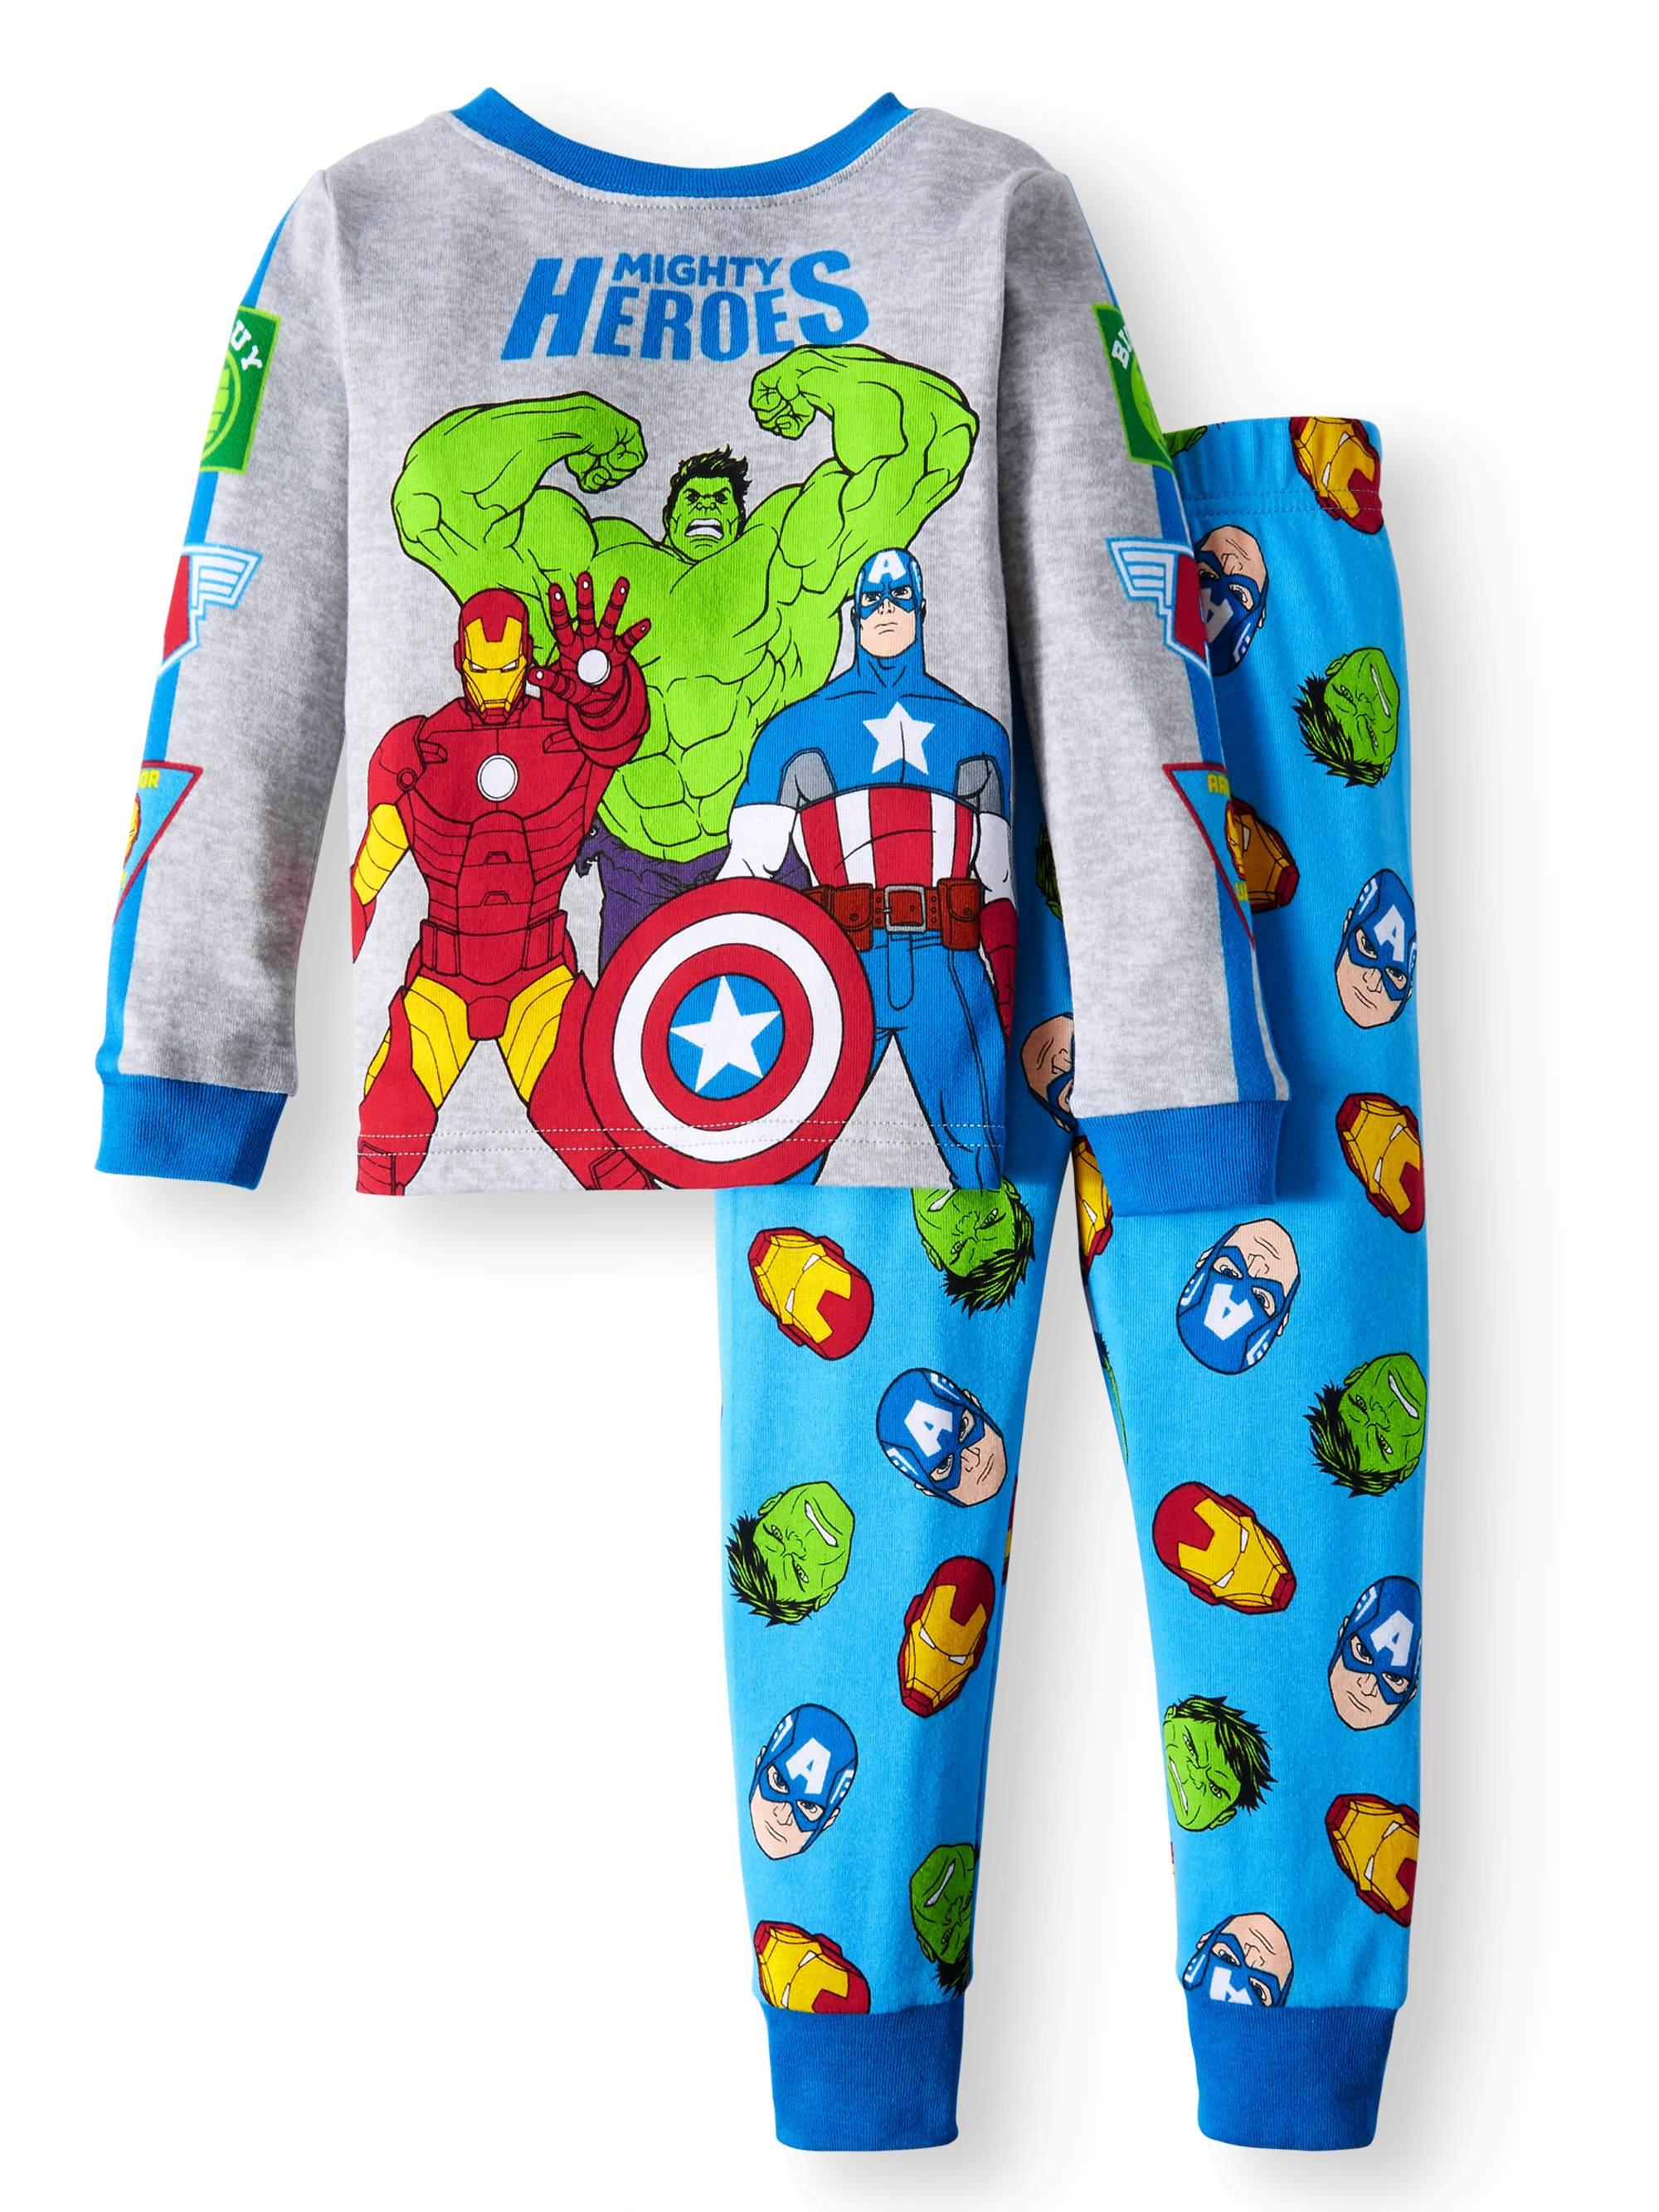 Cotton Tight Fit Pajamas, 2-piece Set (Toddler Boys)